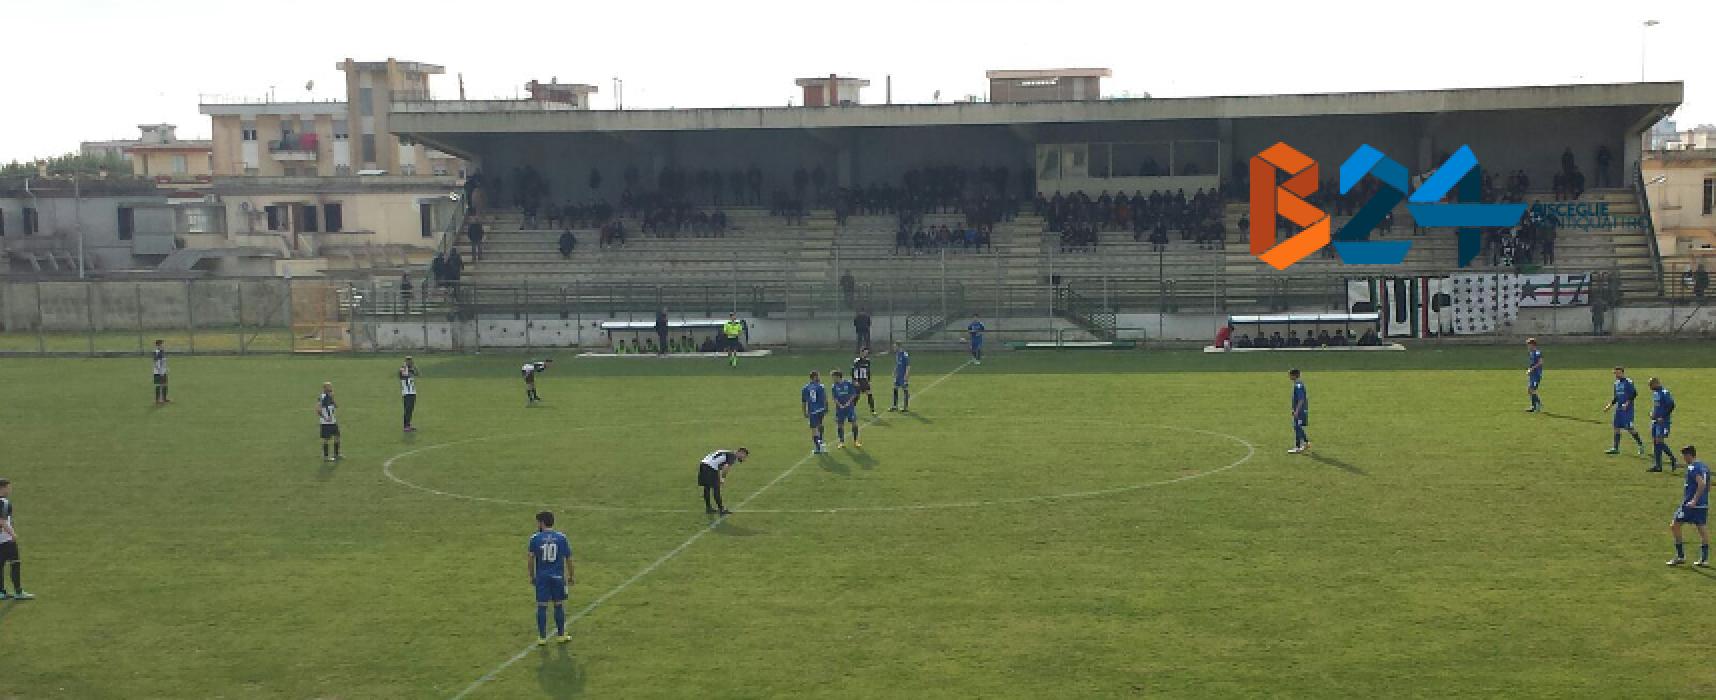 Unione Calcio, Pastorelli risponde a De Mango: a Galatina è pari